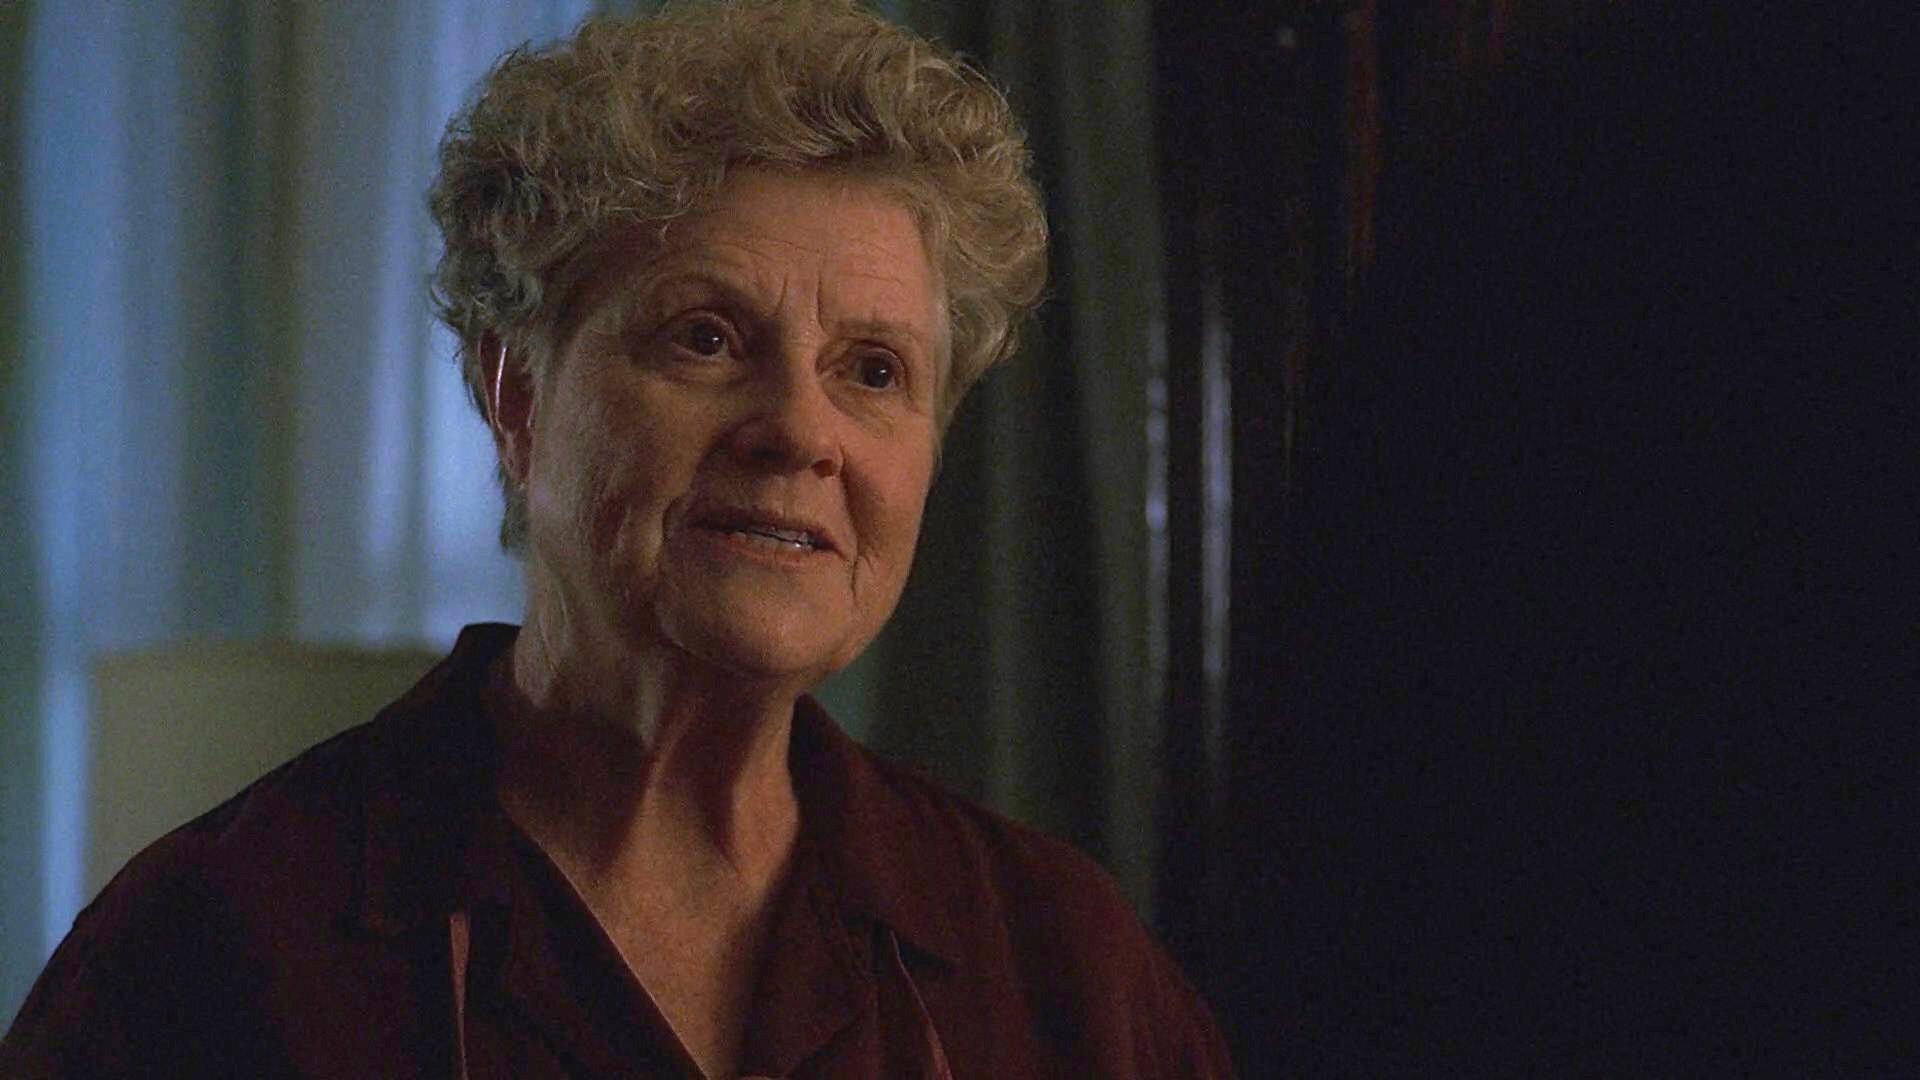 Marjorie Lovett in The X Files (1993)